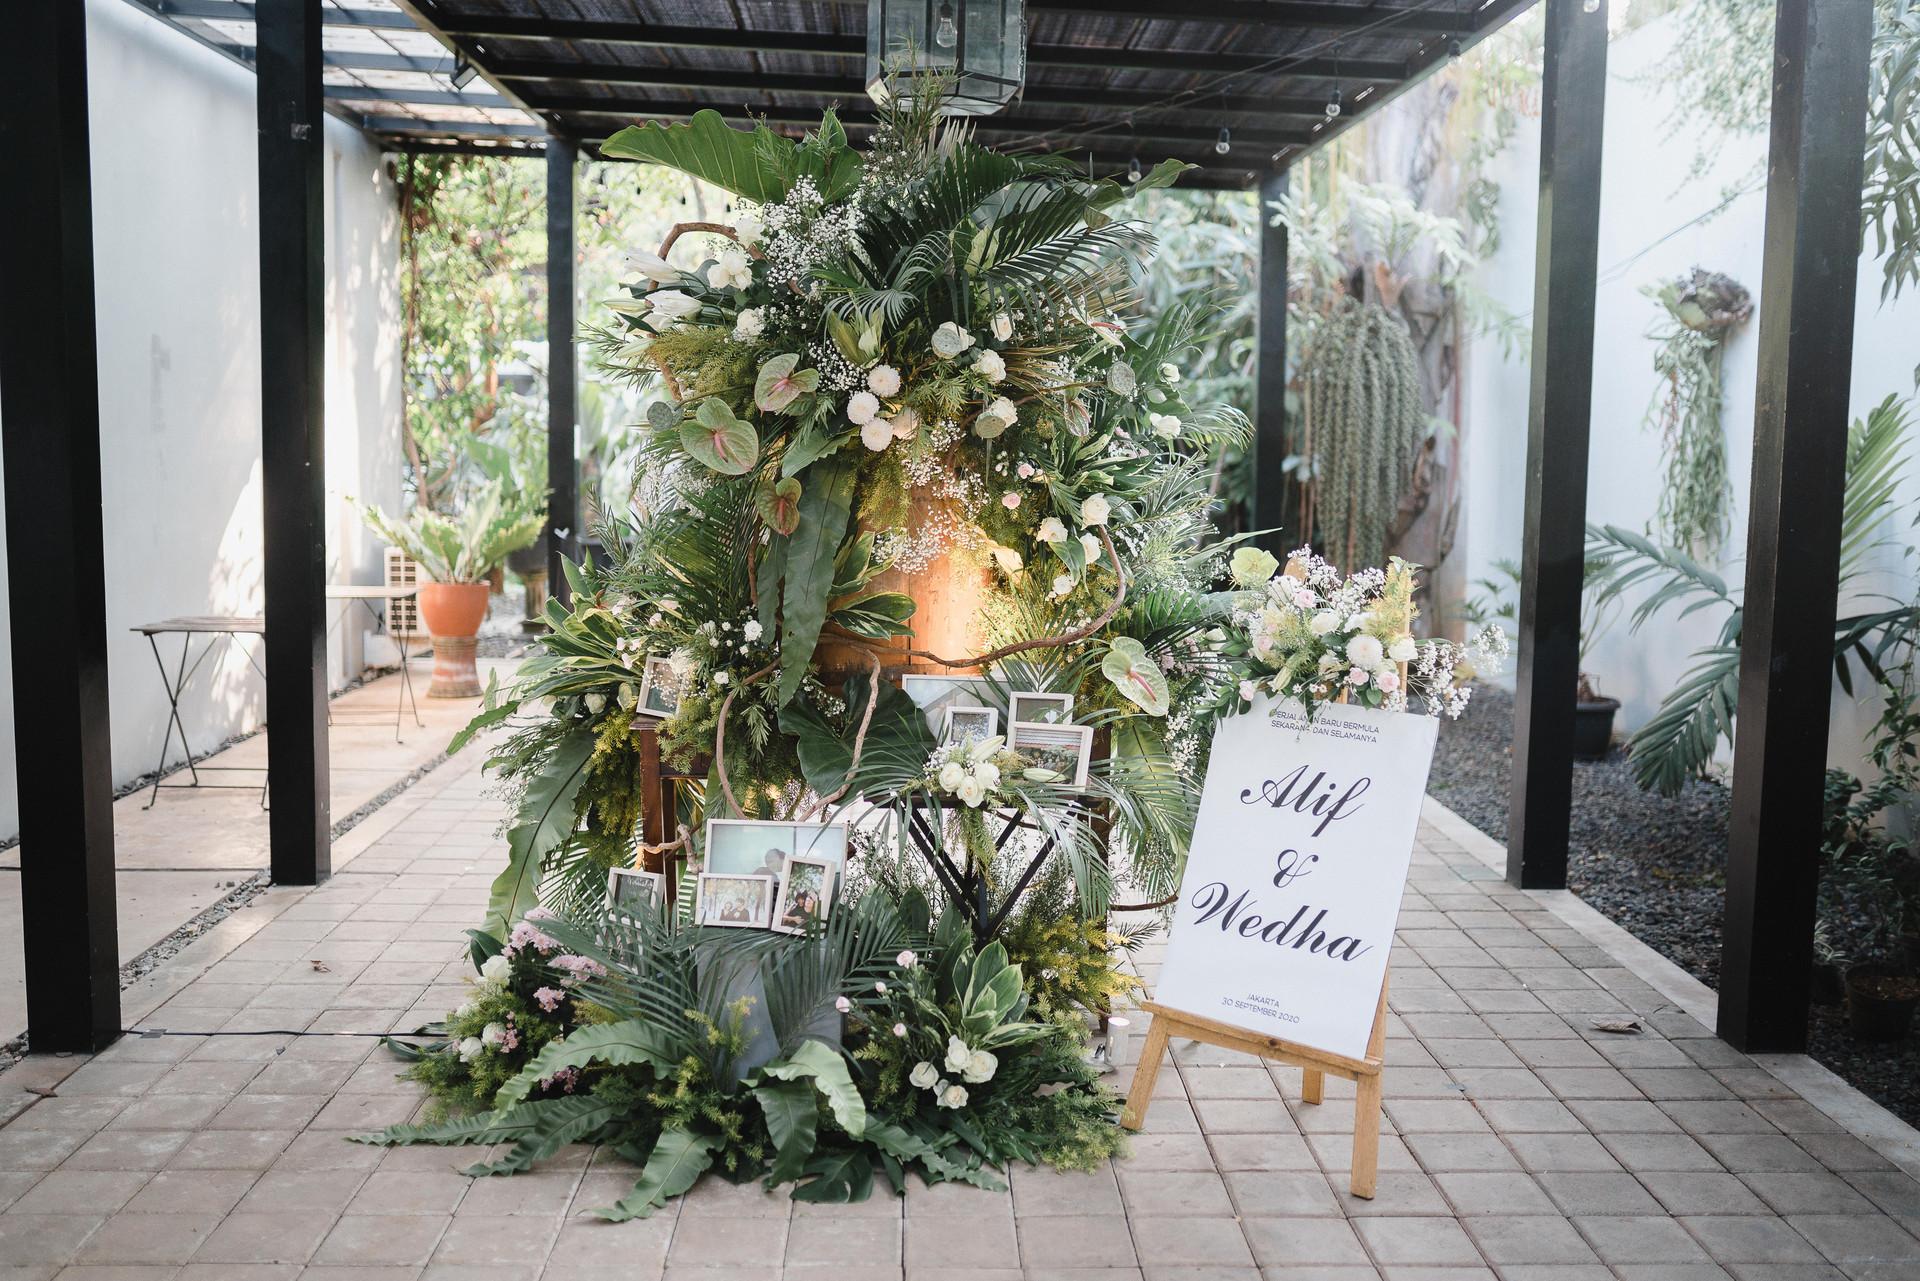 ALIF-WEDHA-WEDDING-16.jpg